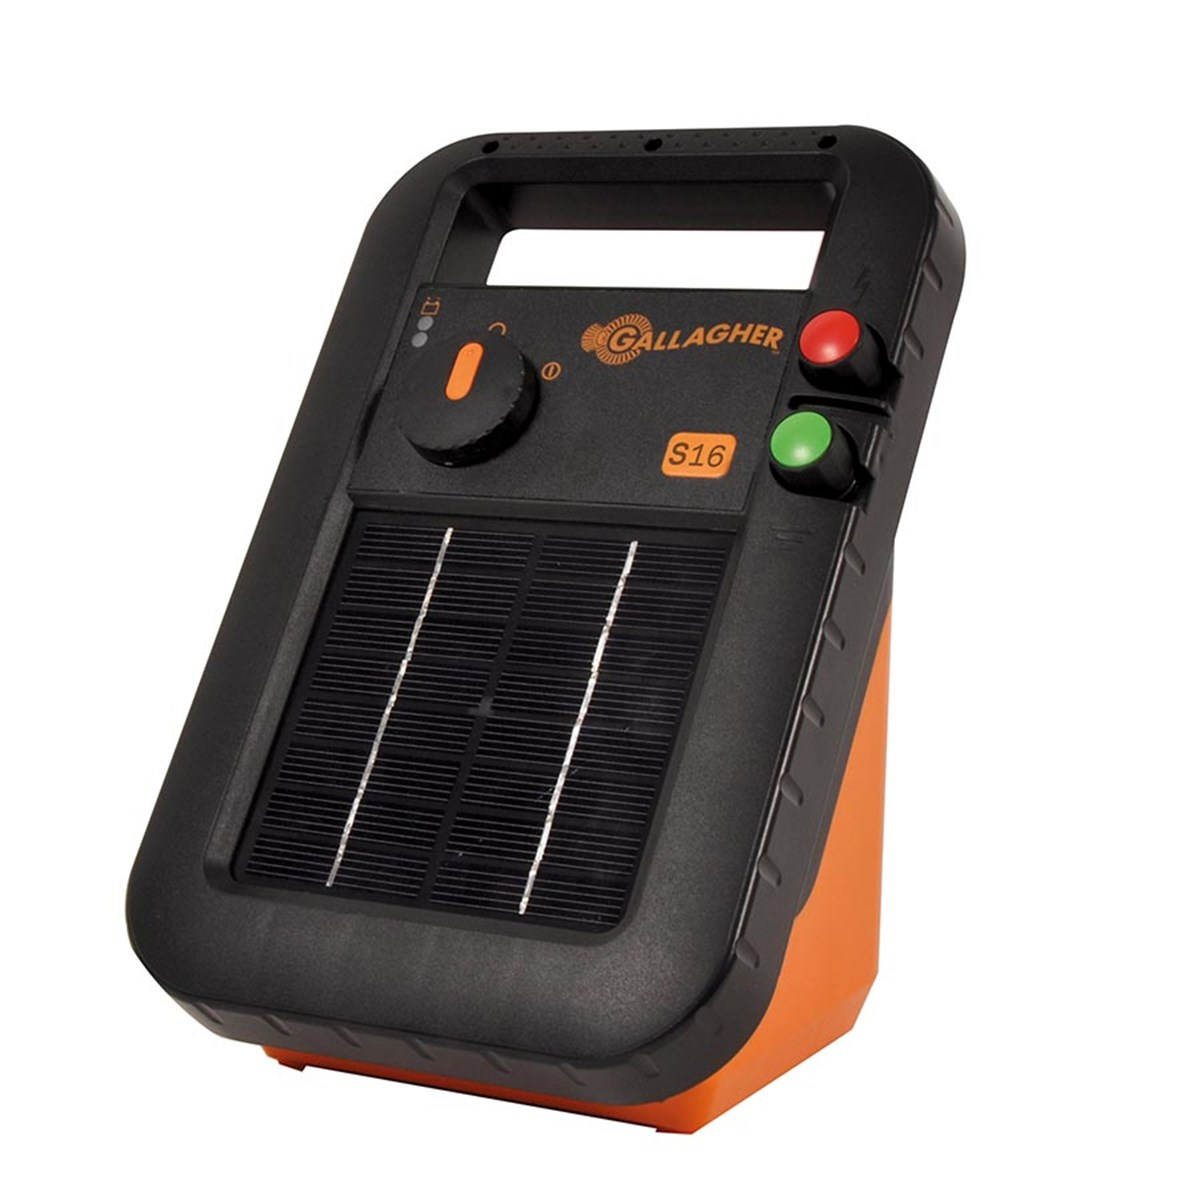 Gallagher s16 inclusief batterij (6v - 1